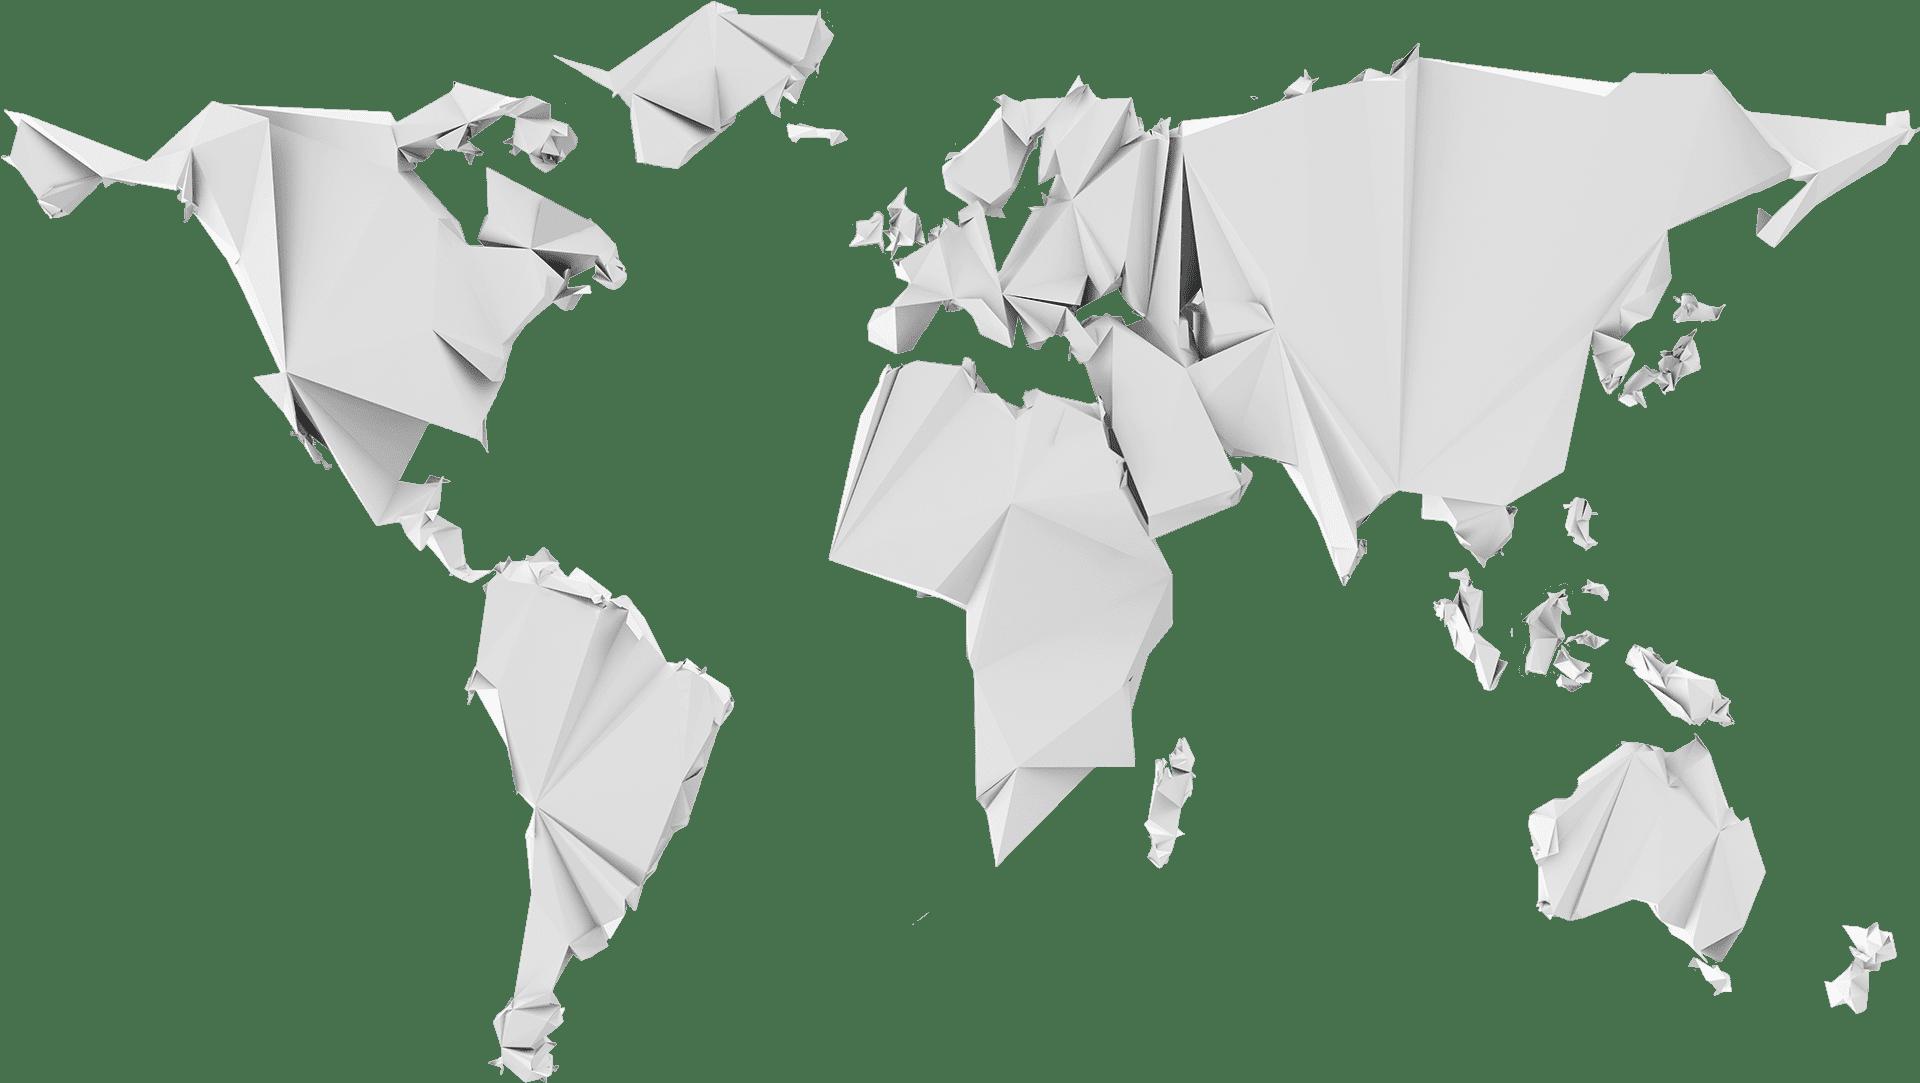 Paper craft world map